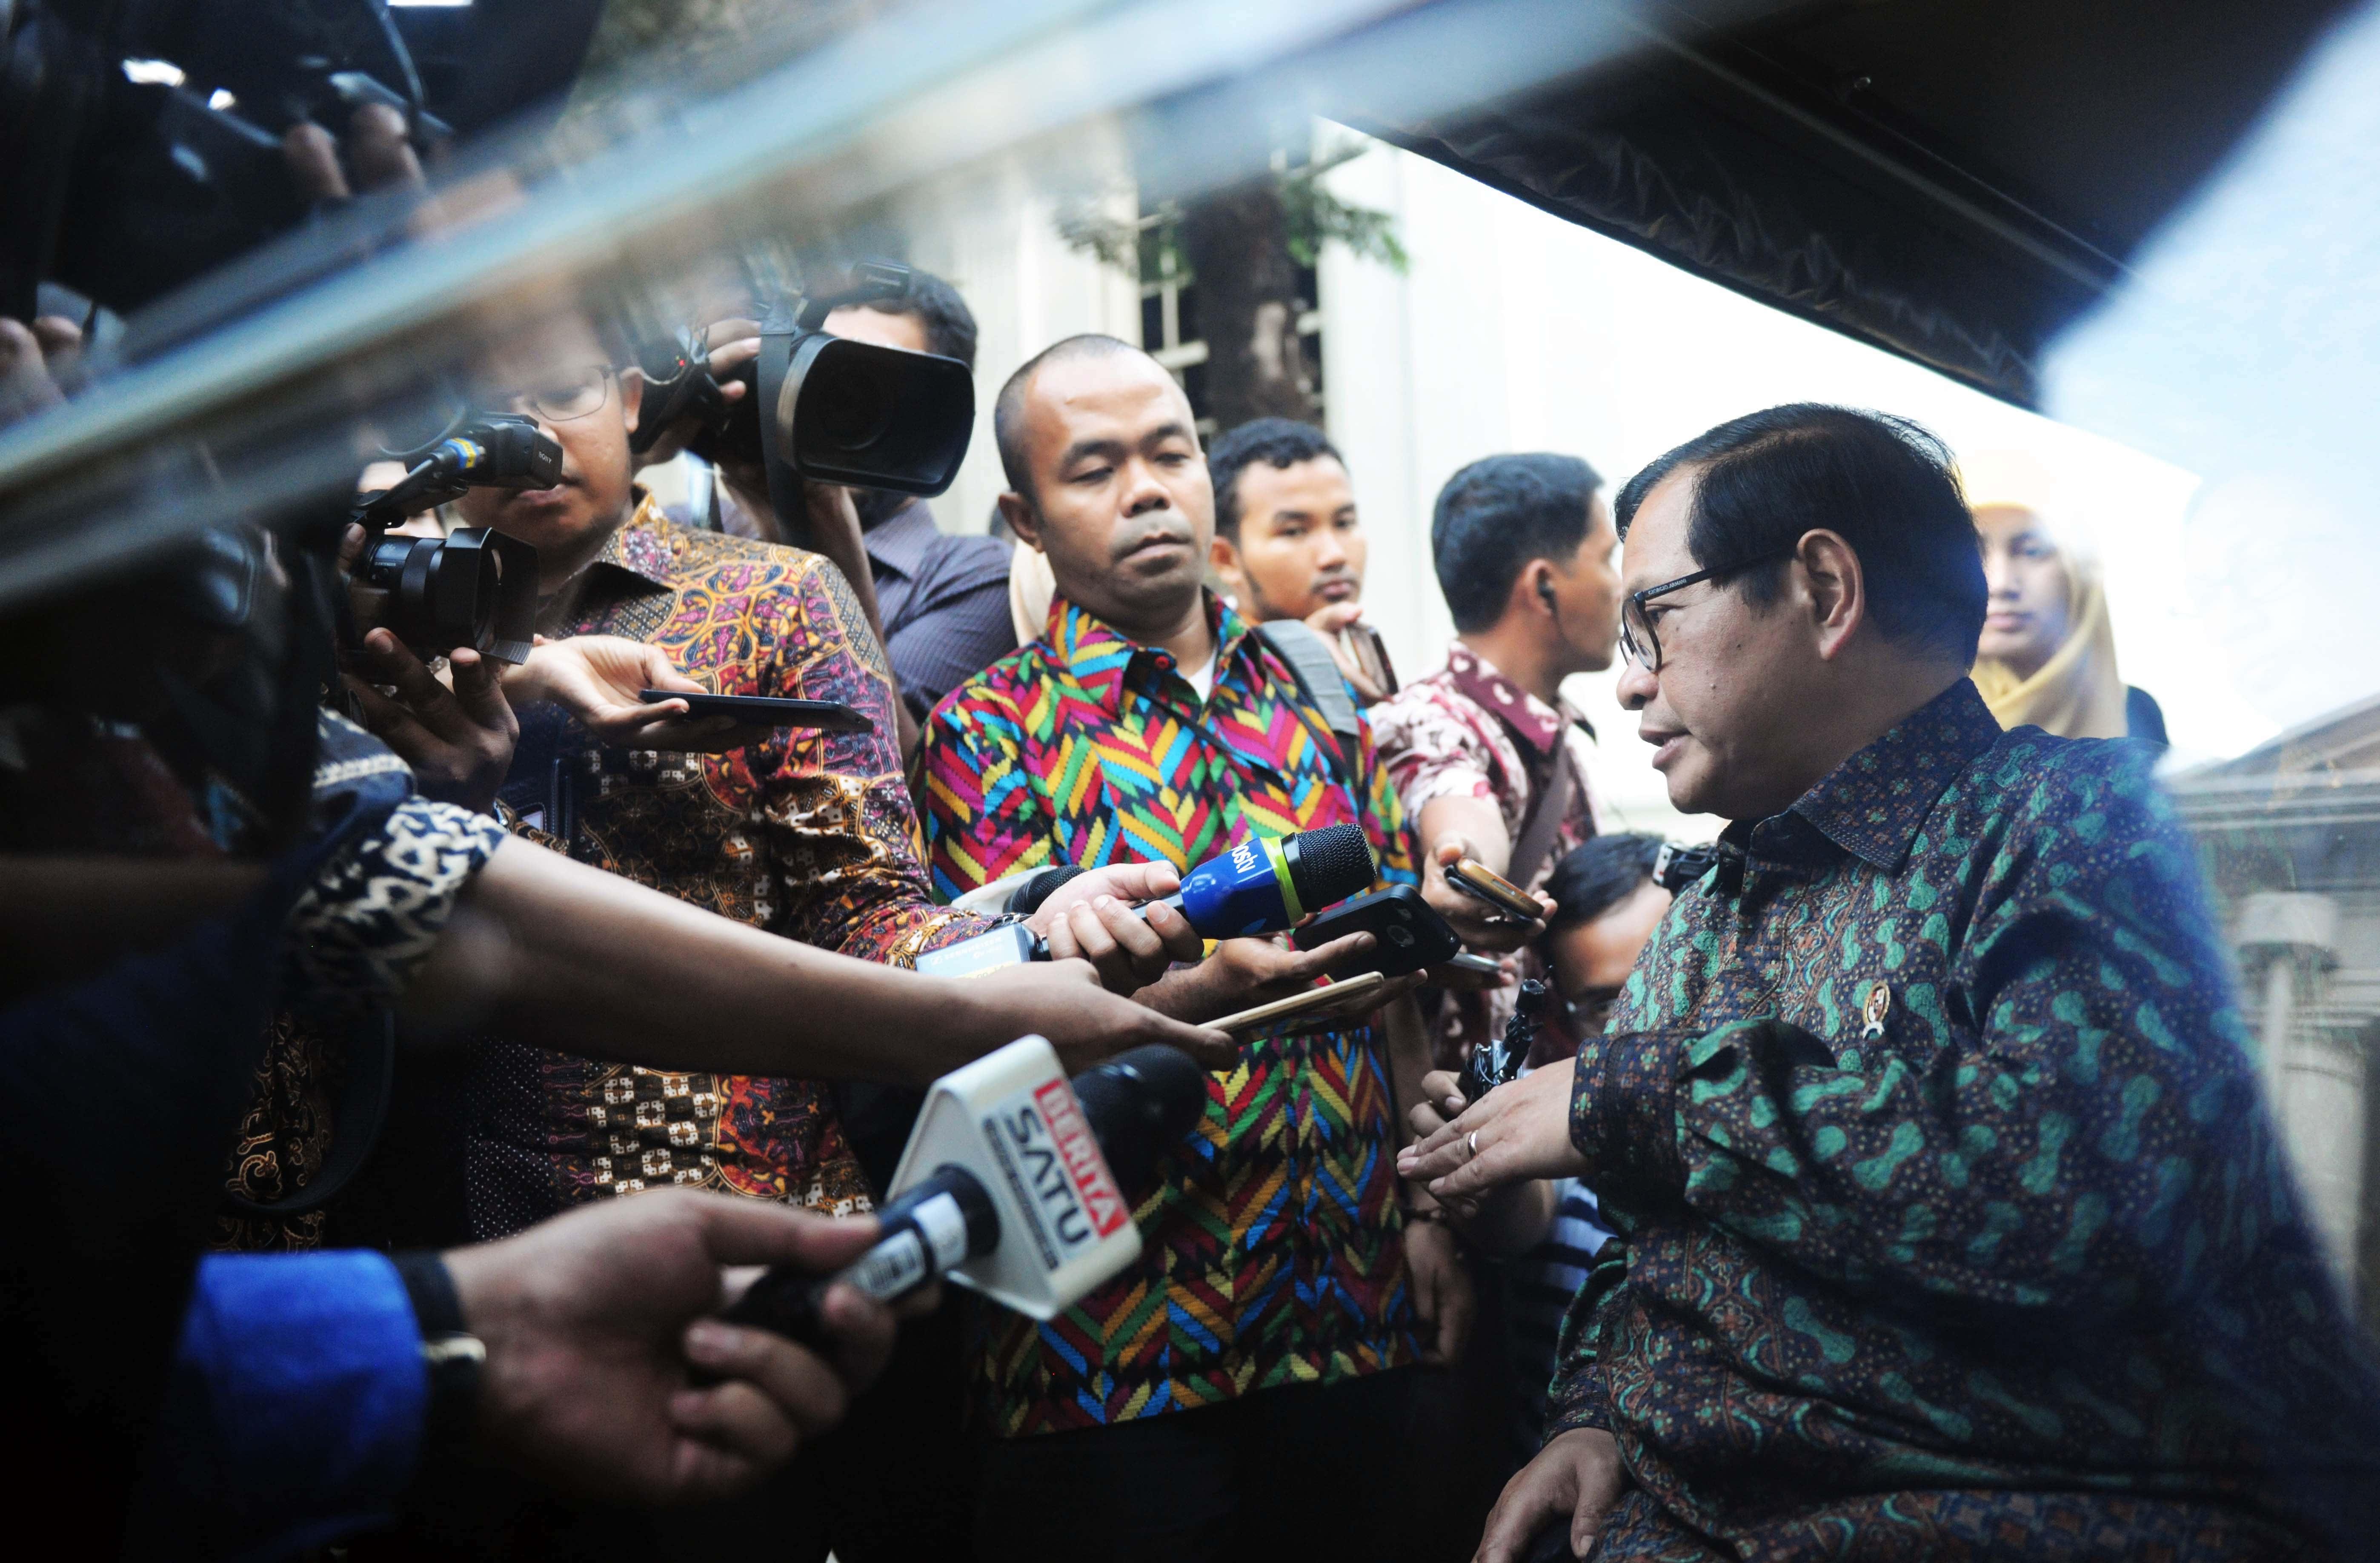 Seskab, Pramono Anung menjawab pertanyaan wartawan usai mengikuti Sidang Kabinet Paripurna, di Istana Negara, Jakarta, Rabu (15/3) petang. (Foto: Humas/Jay)